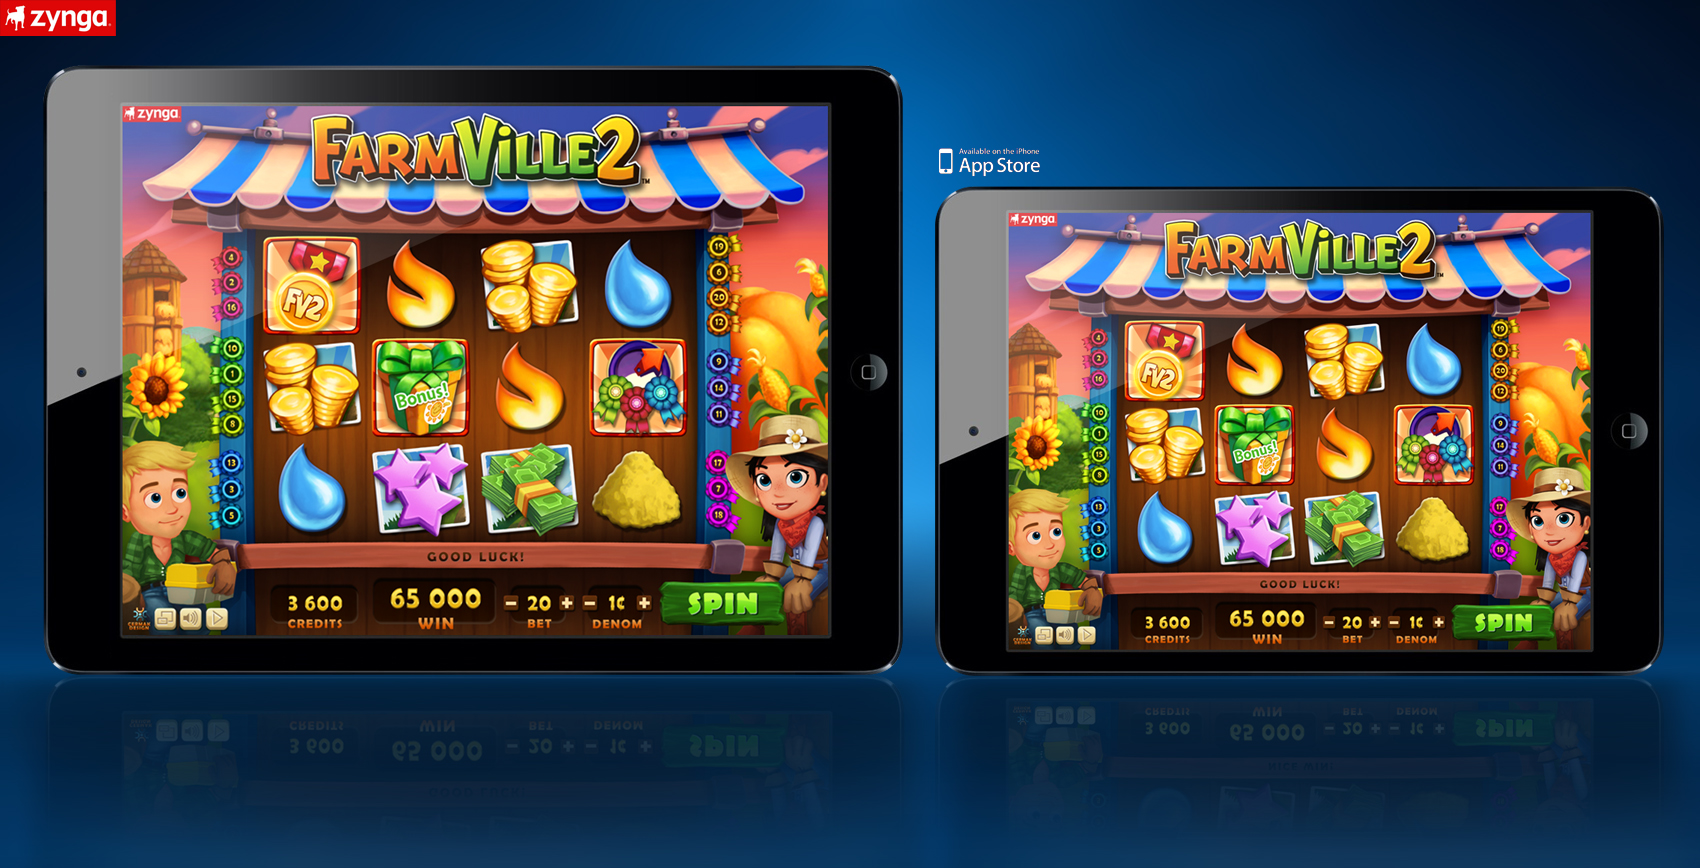 Slot game | Euro Palace Casino Blog - Part 4